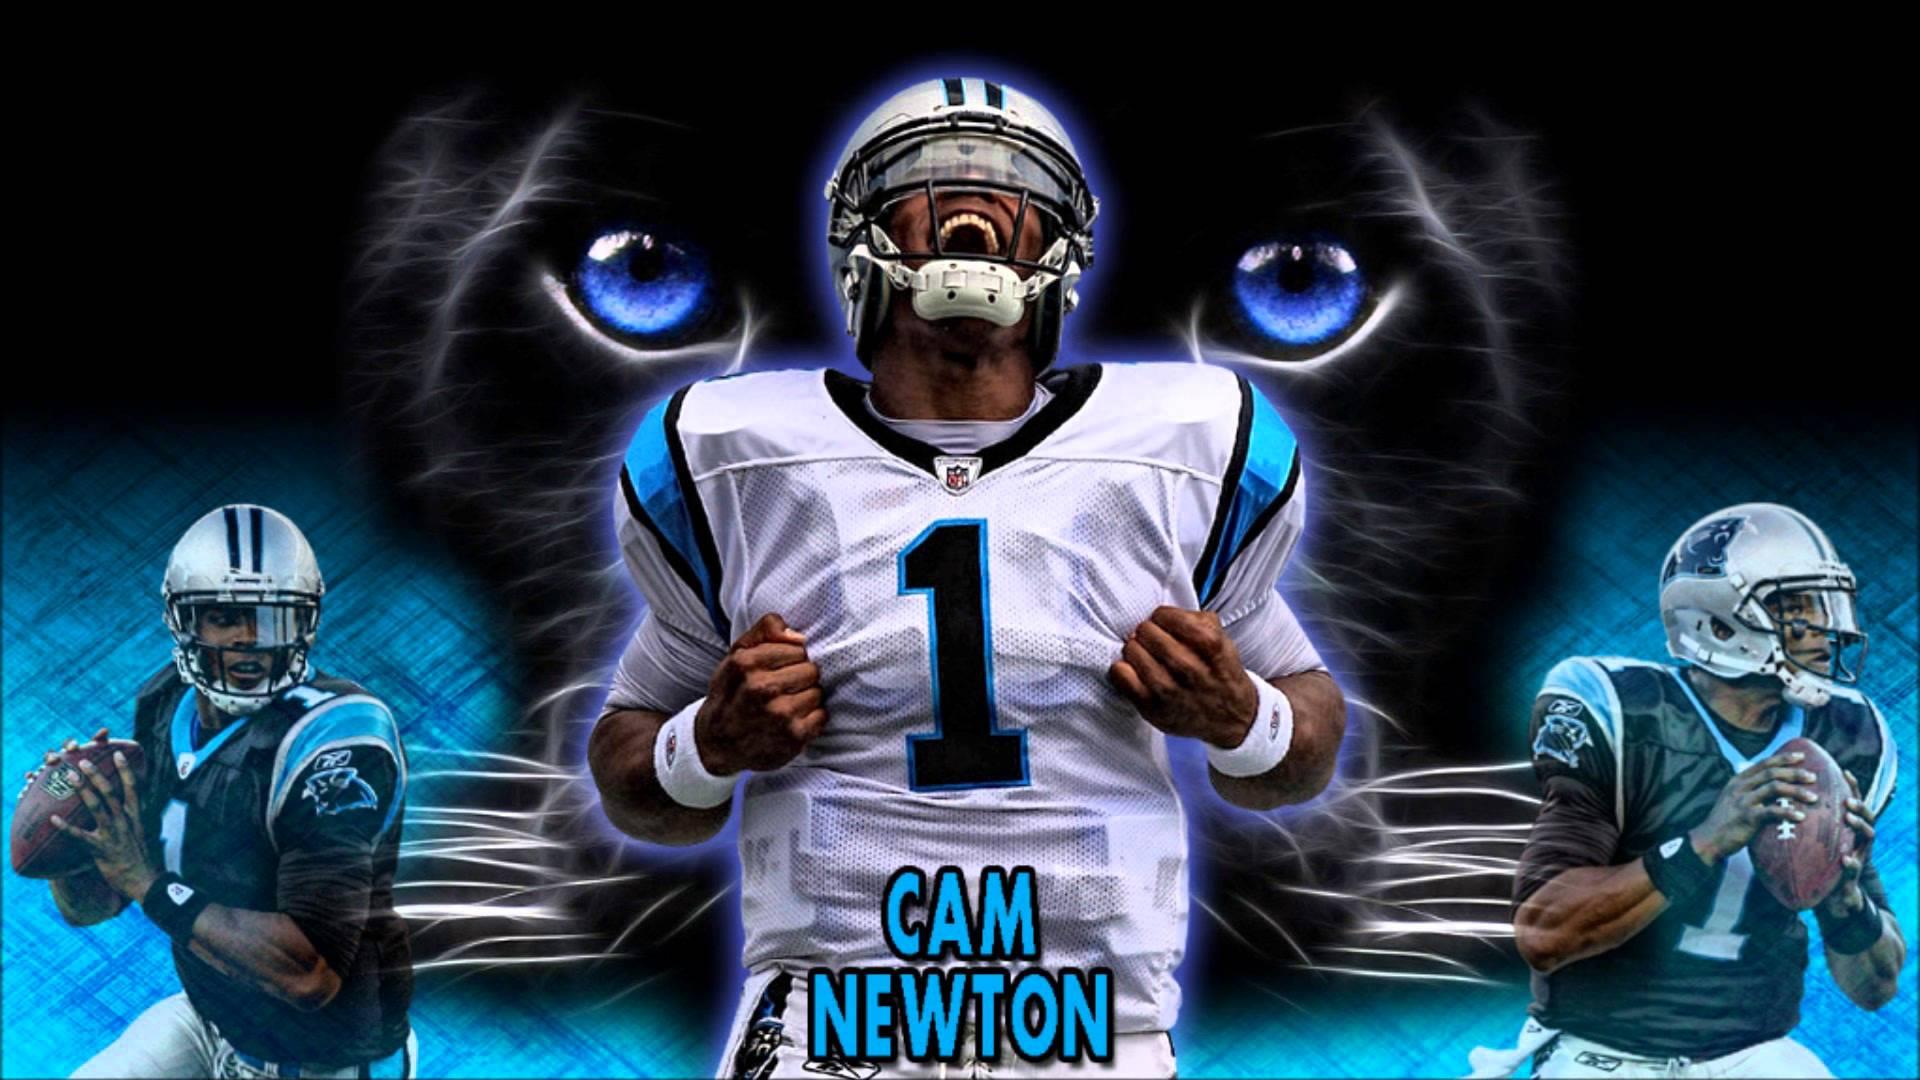 FREE NFL Cam Newton Wallpaper by youtubecom 1920x1080